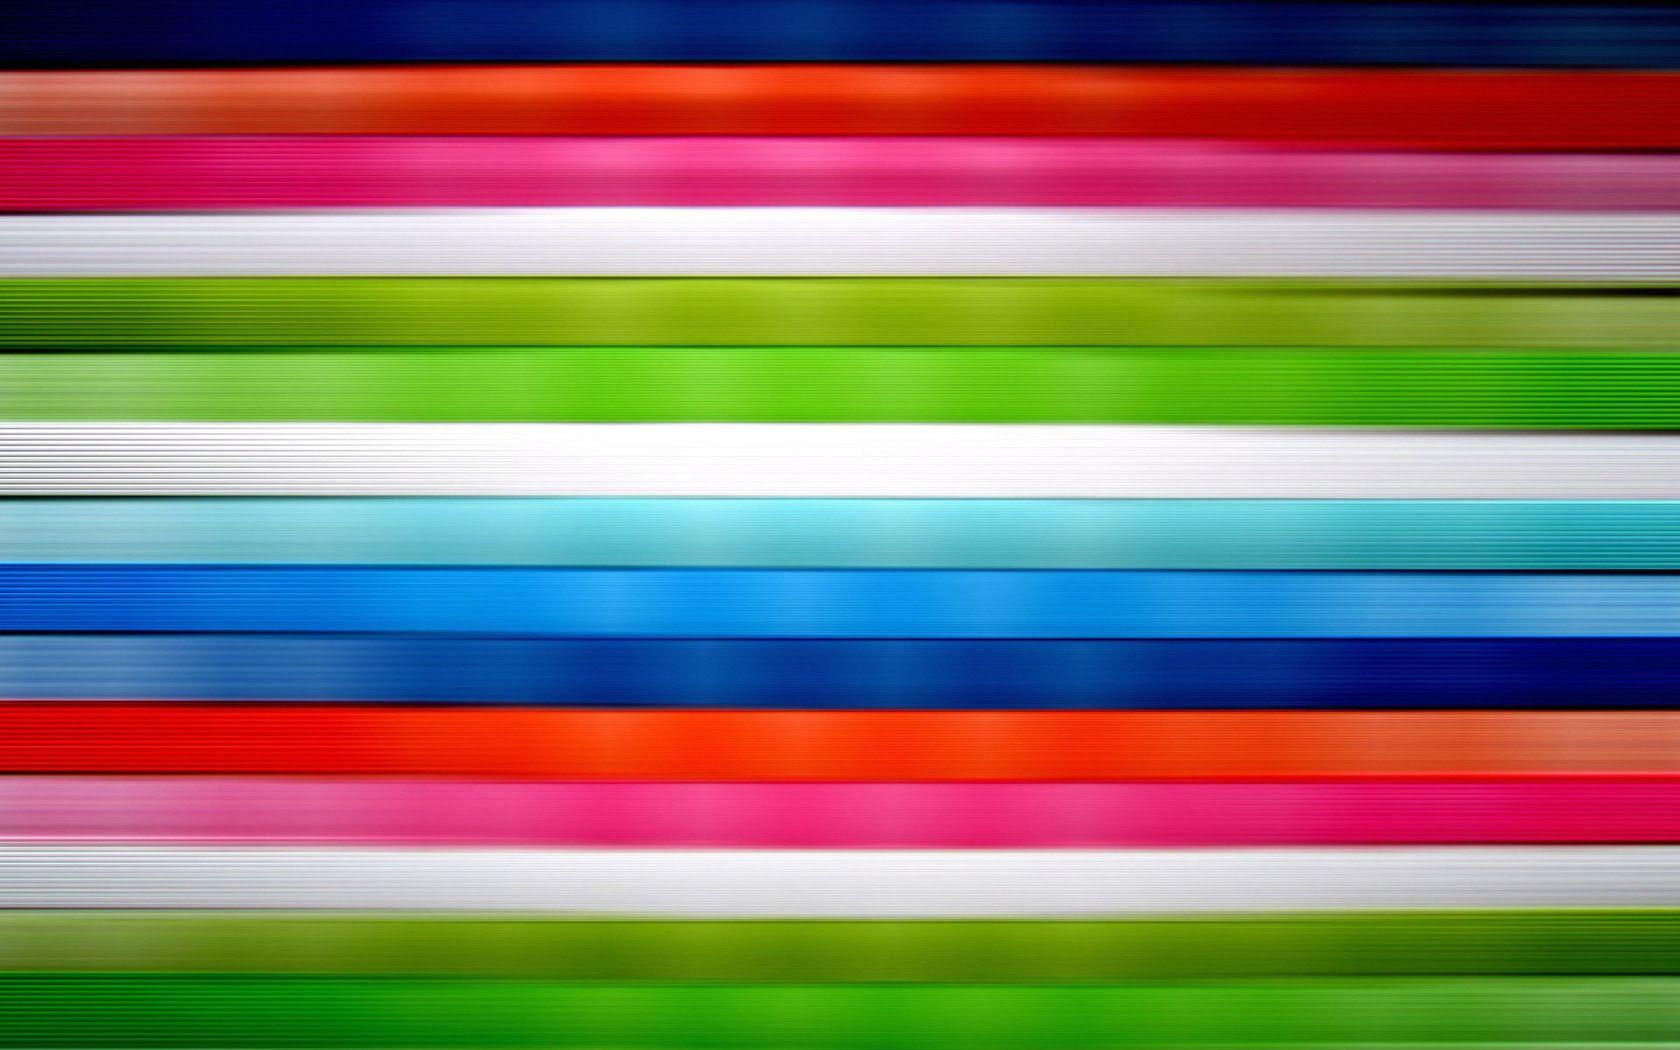 Horizontal Stripes | Download Horizontal vivid colored stripes wallpaper